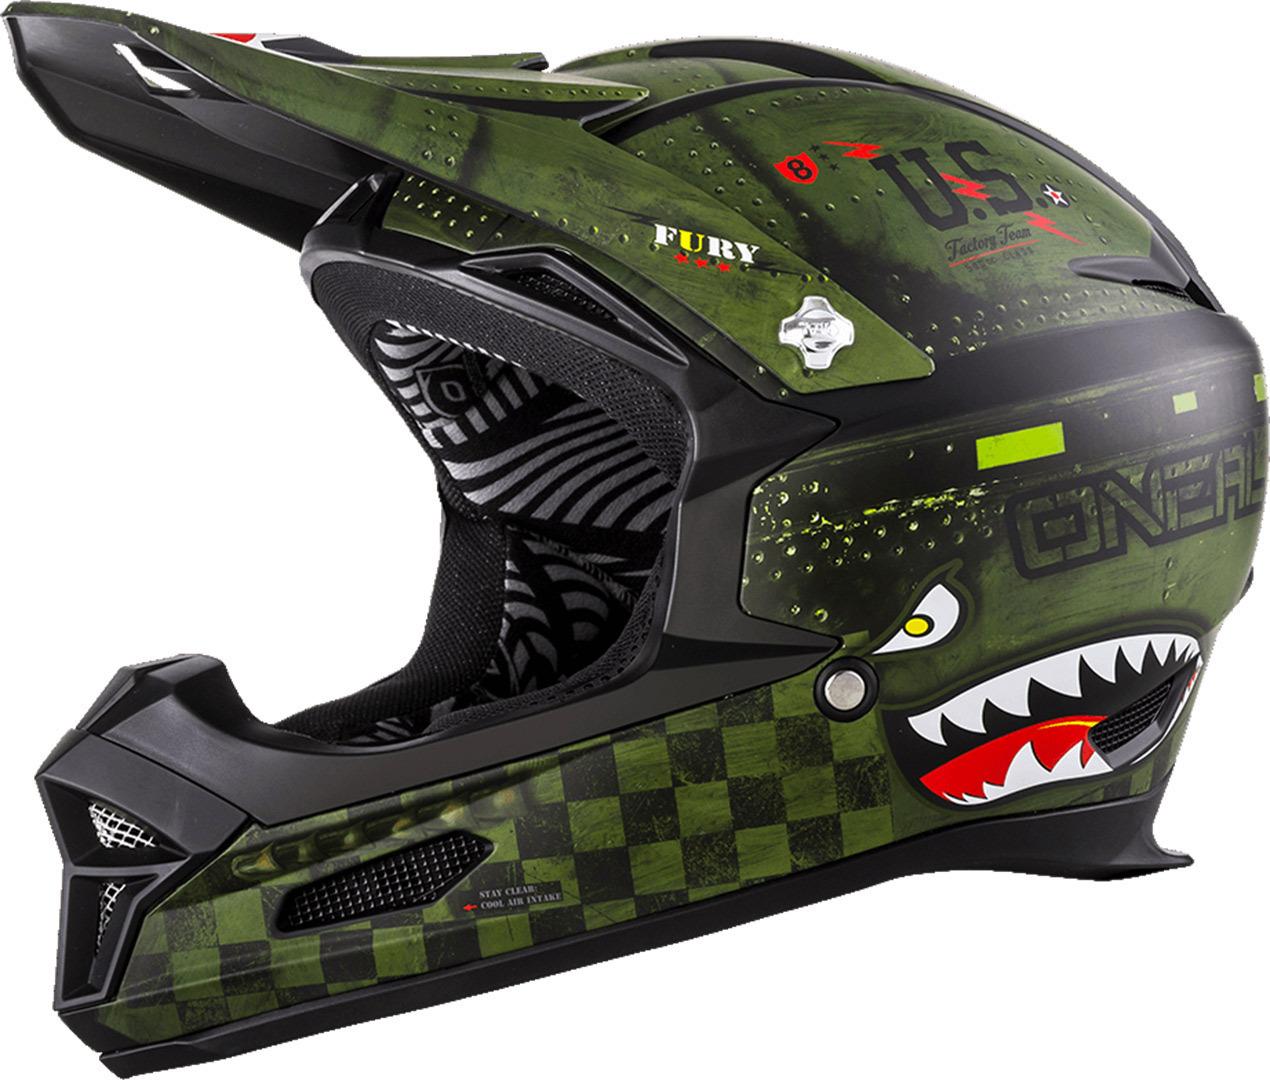 O´Neal Fury RL Warhawk 2018モデル ヘルメット 自転車 ダウンヒル MTB XC BMX マウンテンバイク ロード クロスカントリー 【WARHAWK】【AMACLUB】【かっこいい】